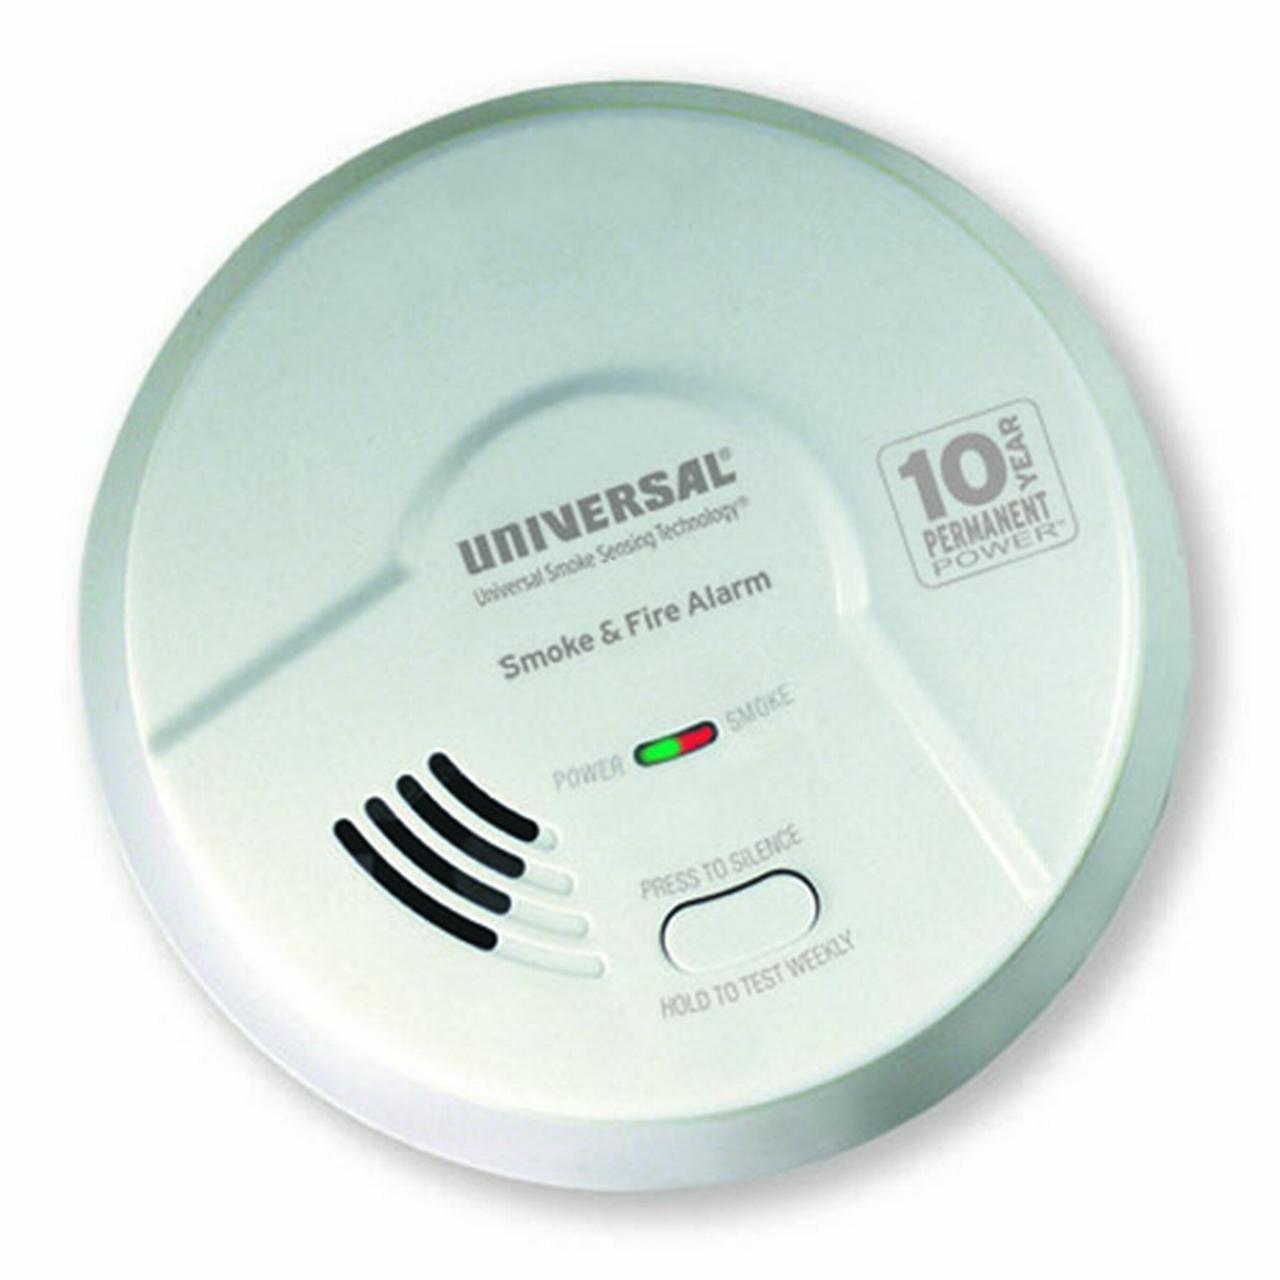 USI Kitchen 2-in-1 Smoke & Fire Smart Alarm with 10 year Sealed Battery & Universal Smoke Sensing  Technology (MDSK300S)